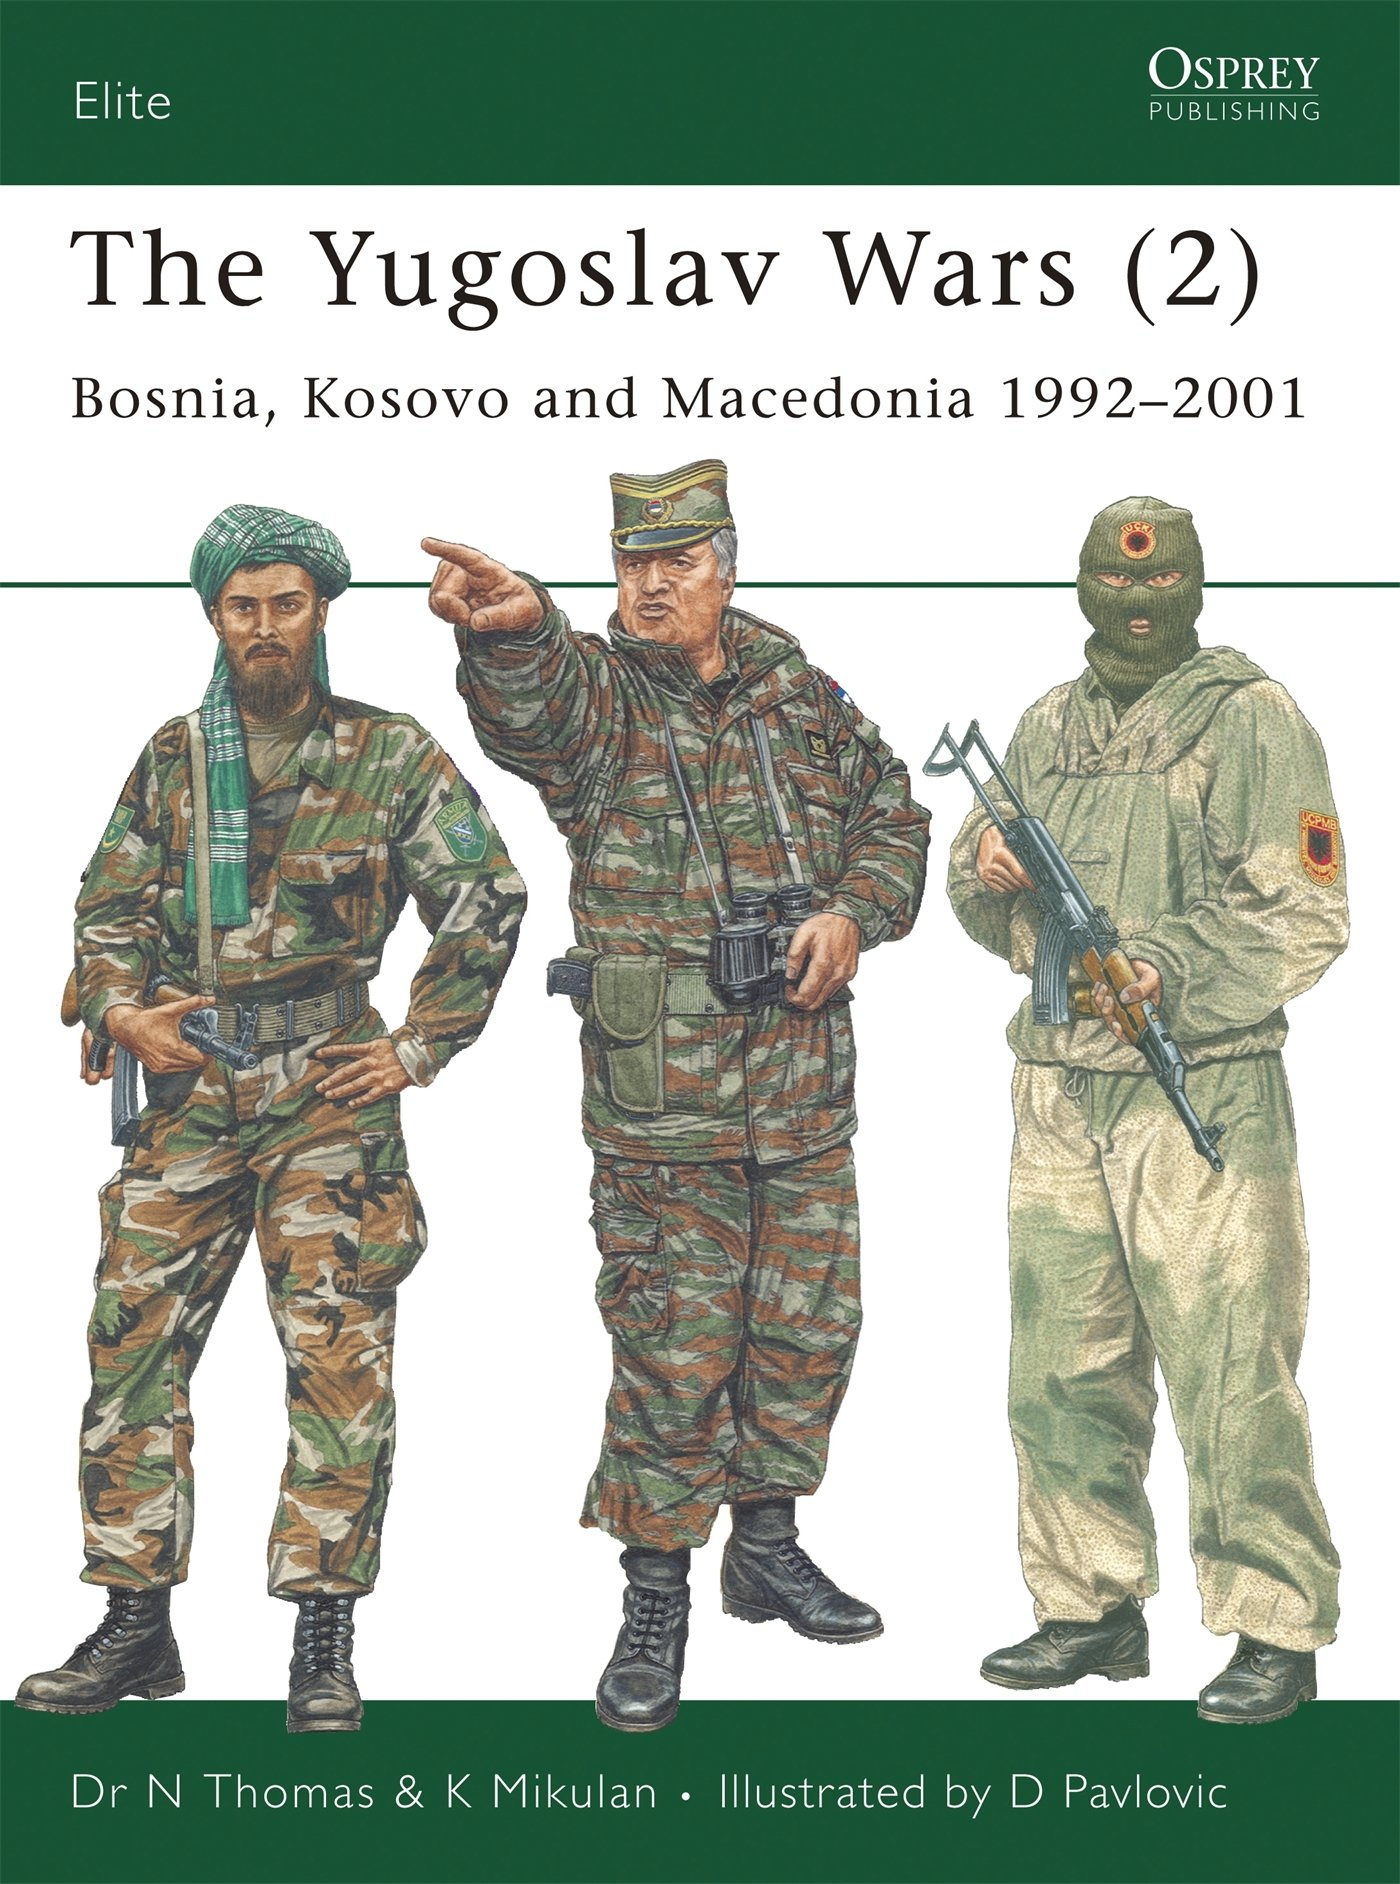 The Yugoslav Wars (2): Bosnia, Kosovo and Macedonia 1992-2001 (Elite) (No. 2): Nigel Thomas, K Mikulan, Darko Pavlovic: 9781841769646: Amazon.com: Books